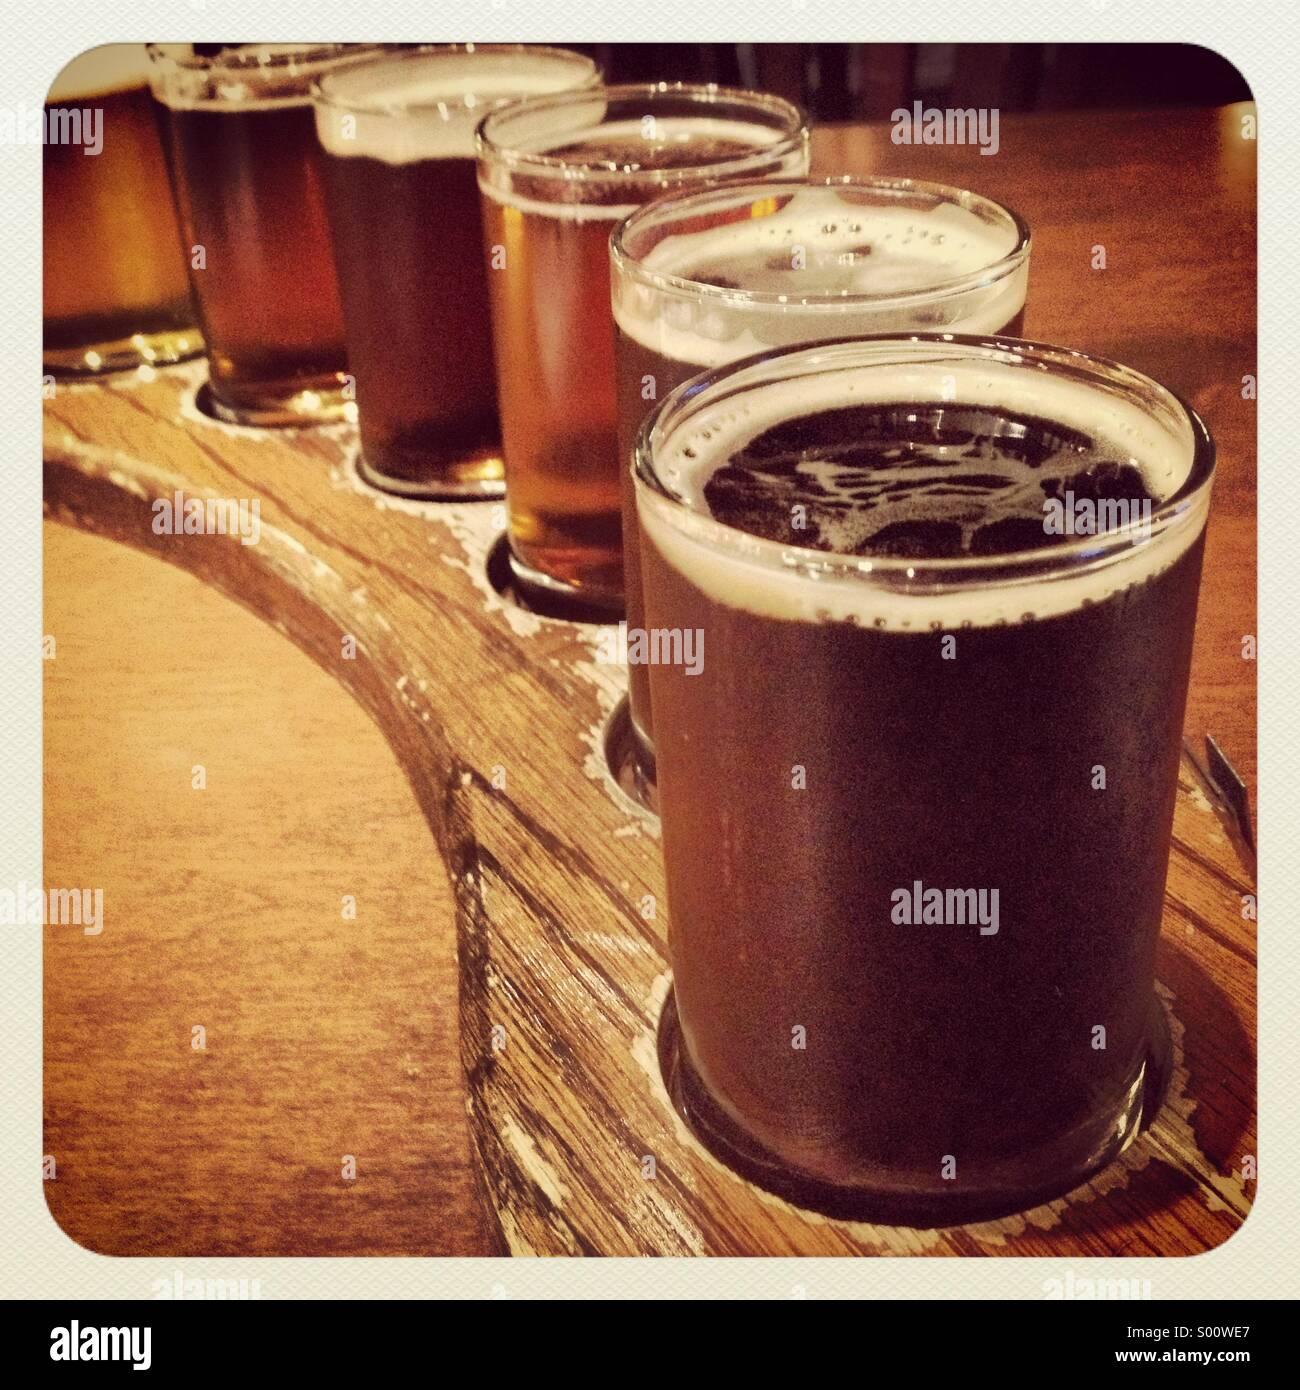 a-sampler-tray-of-beer-S00WE7.jpg